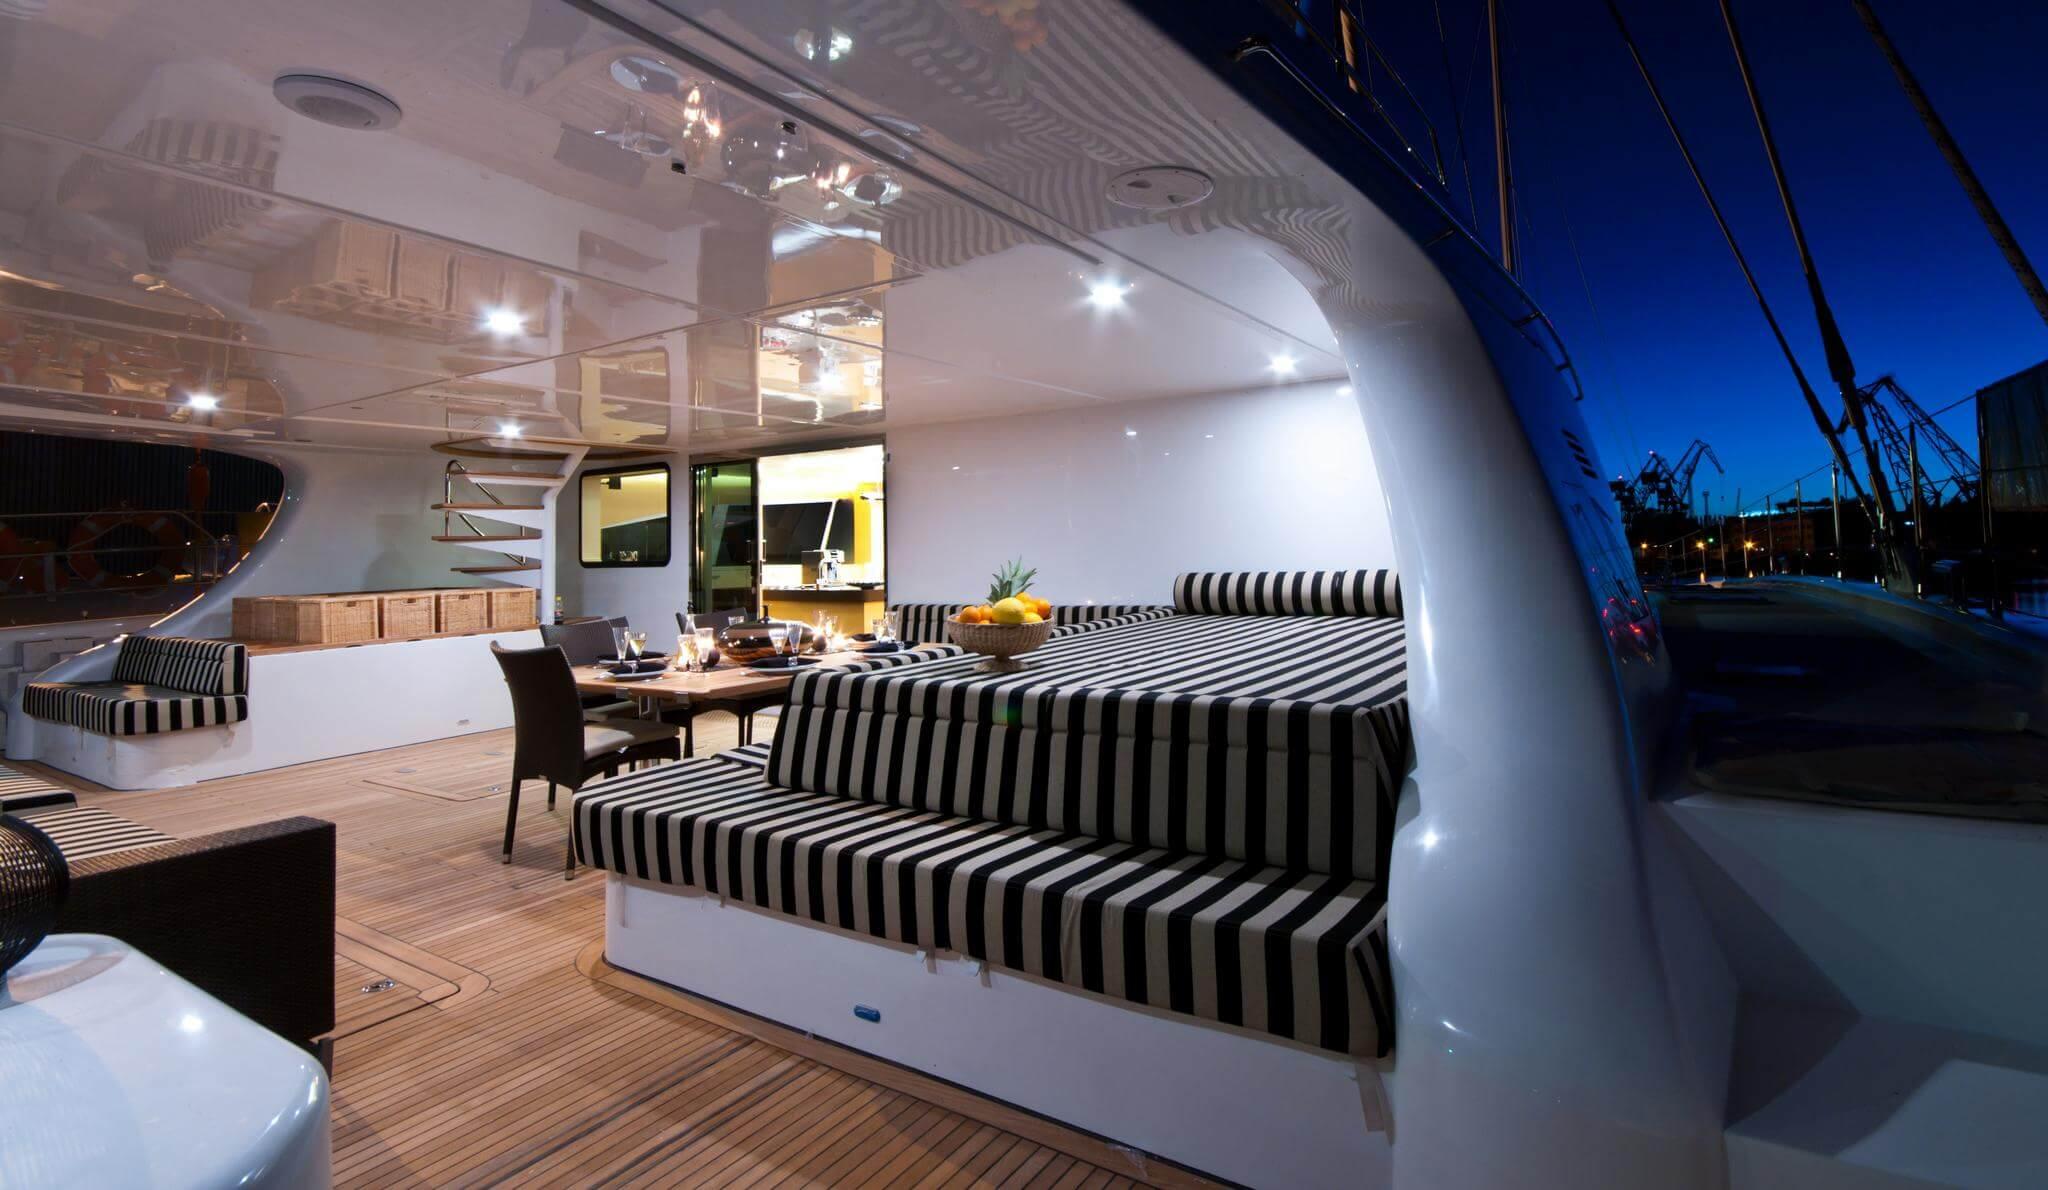 Launched Sail Catamaran for Sale  Sunreef 102 DD Deck & Equipment